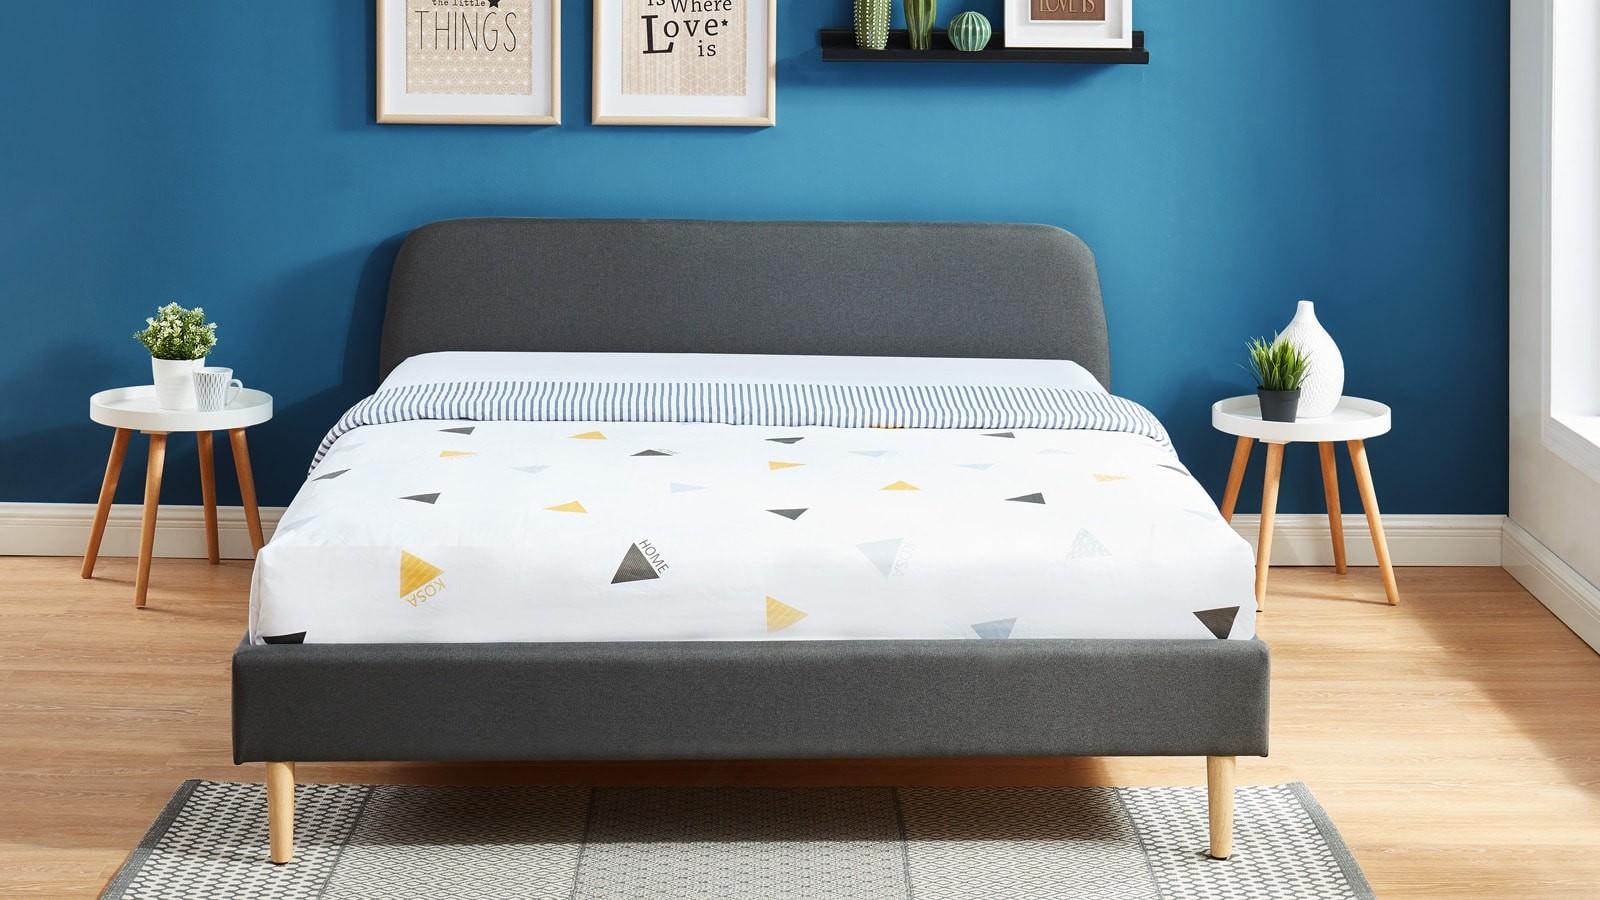 lit adulte scandinave 140x190 gris fonc collection gaby homifab. Black Bedroom Furniture Sets. Home Design Ideas